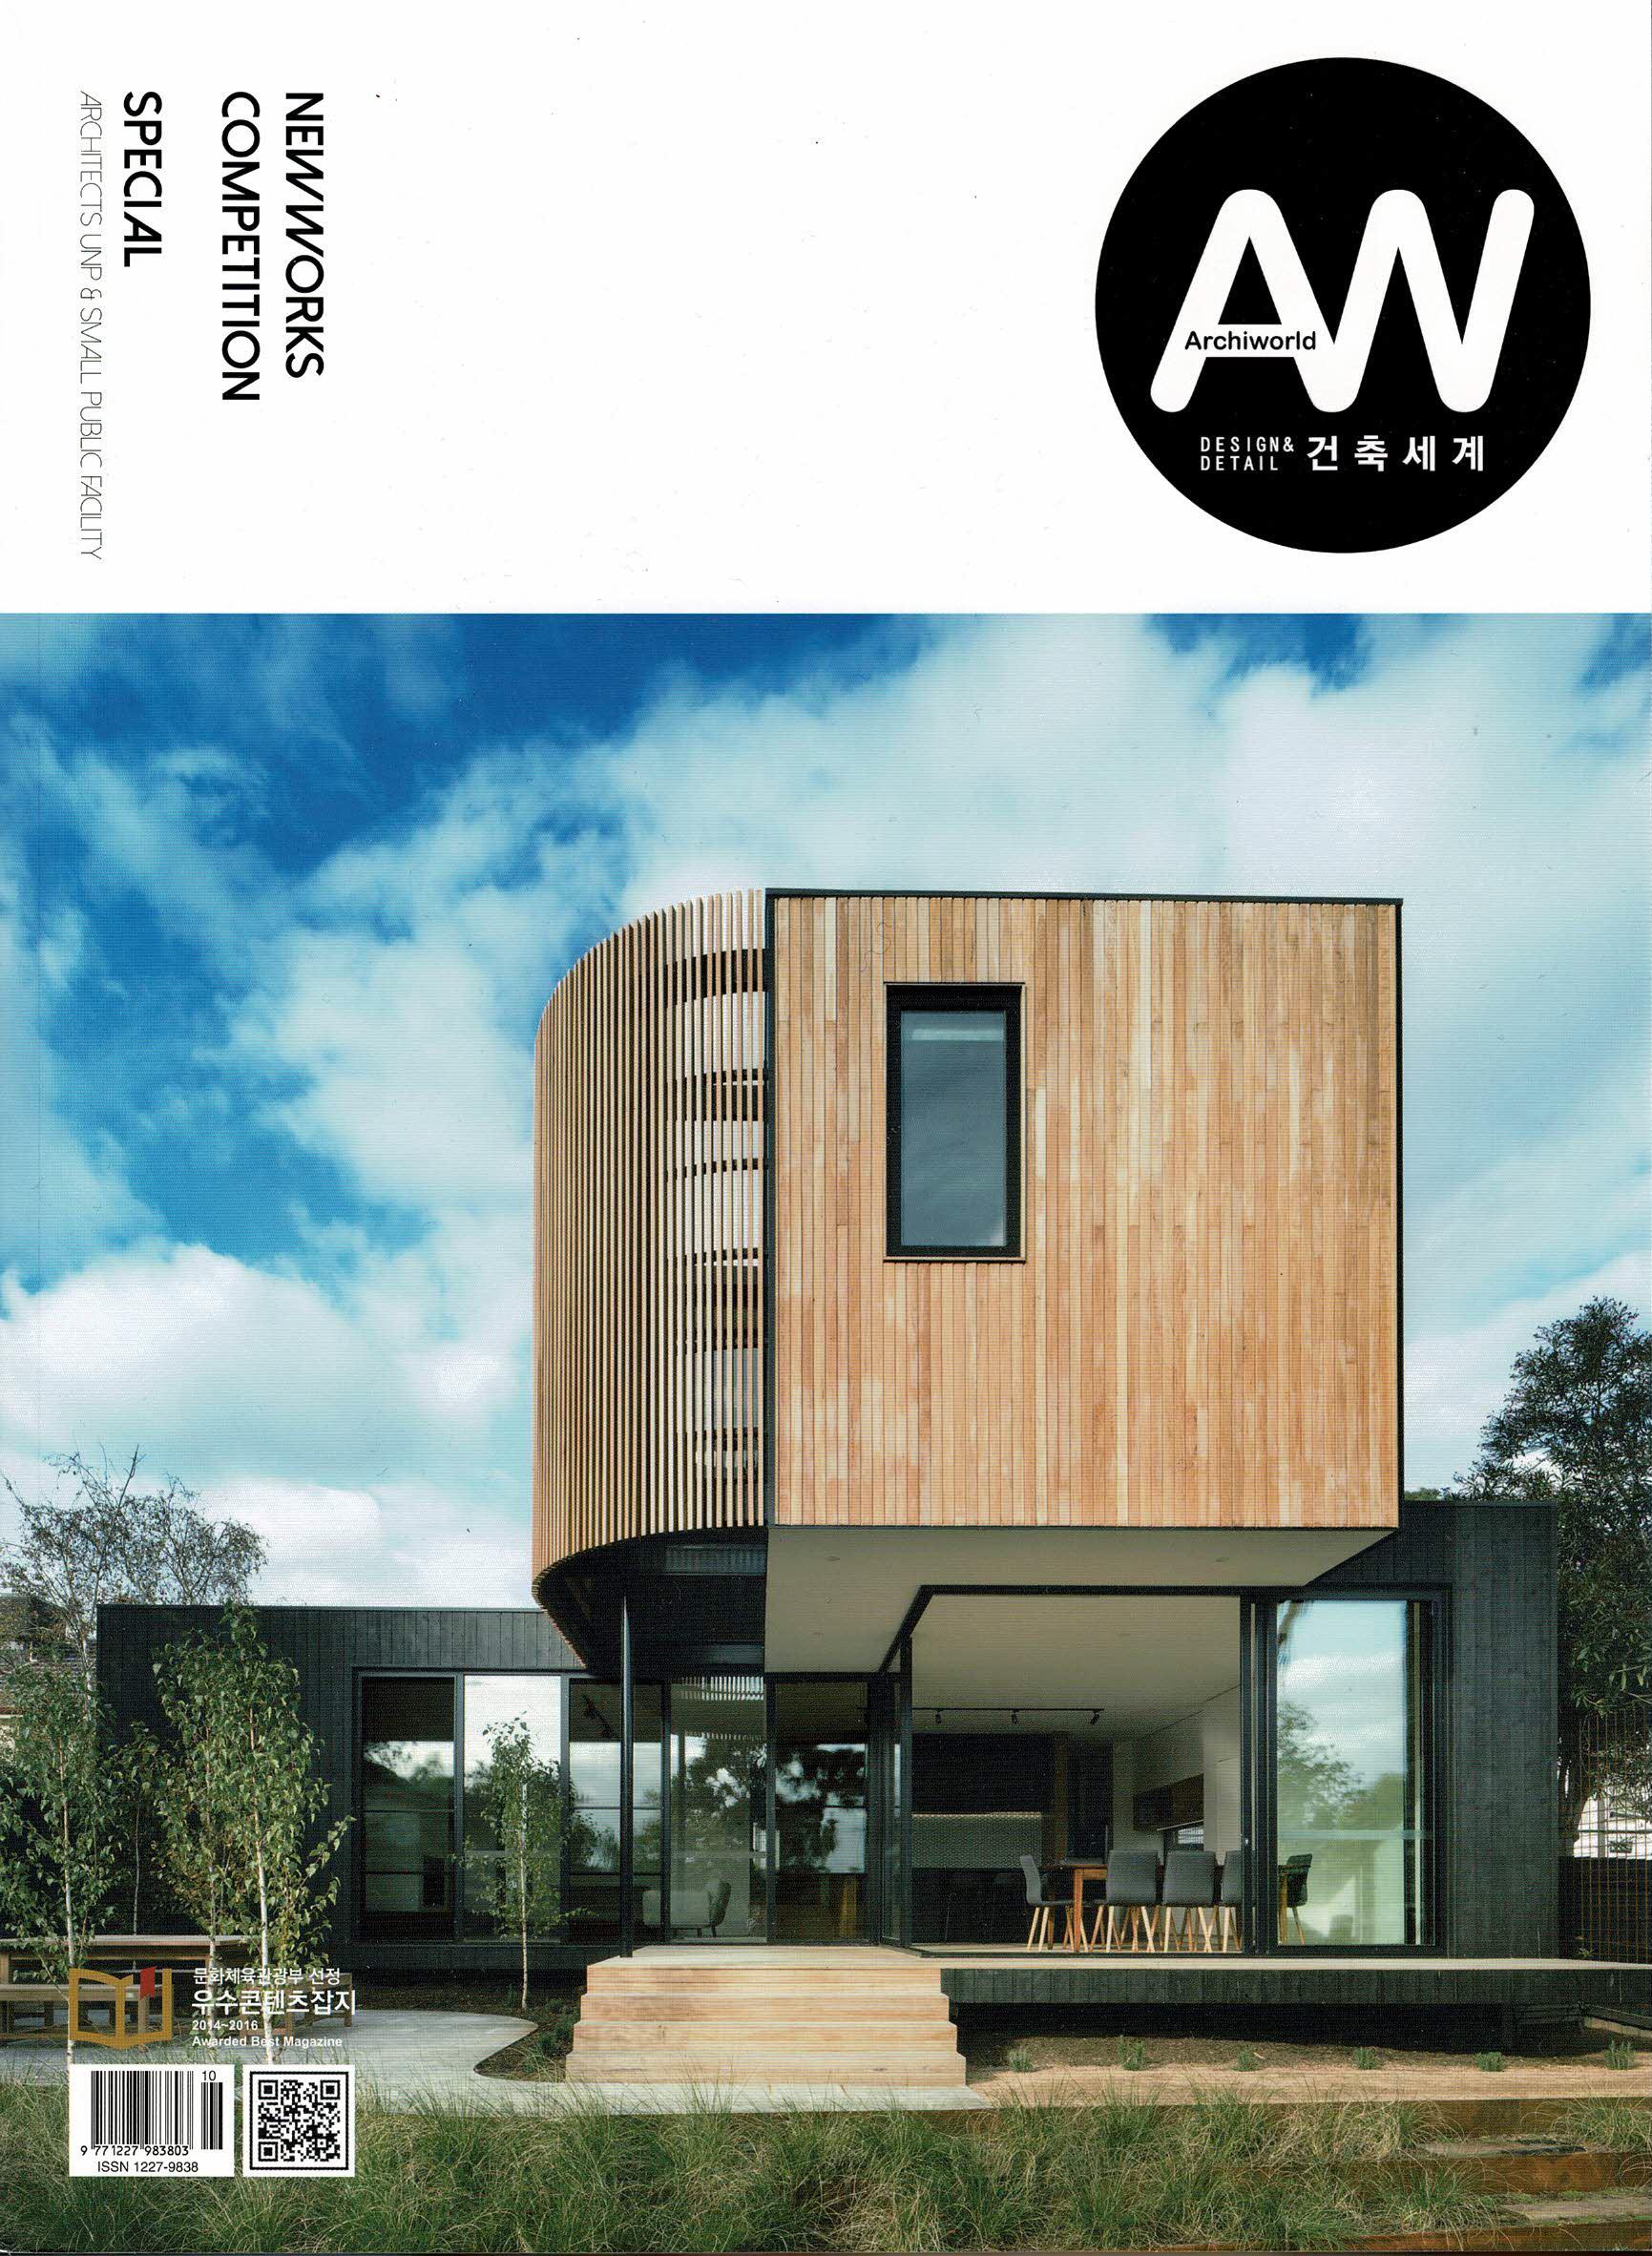 Archiworld magazine design & detail 281 LANDÍNEZ+REY arquitectos iA_house